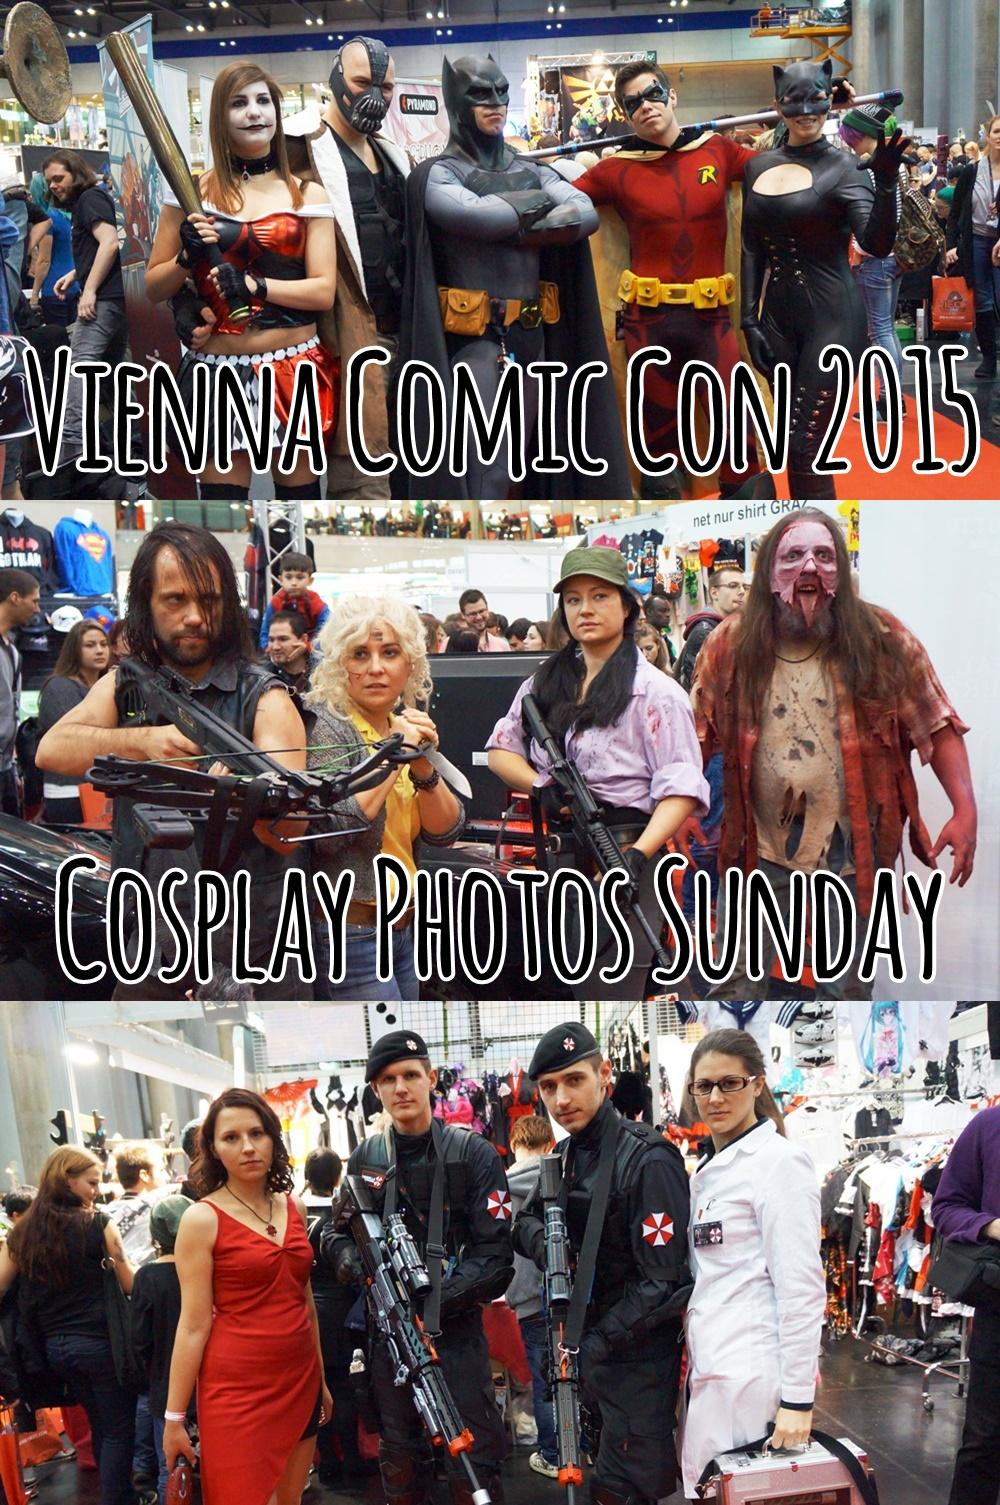 Vienna Comic Con 2015 - Cosplay Photos Sunday